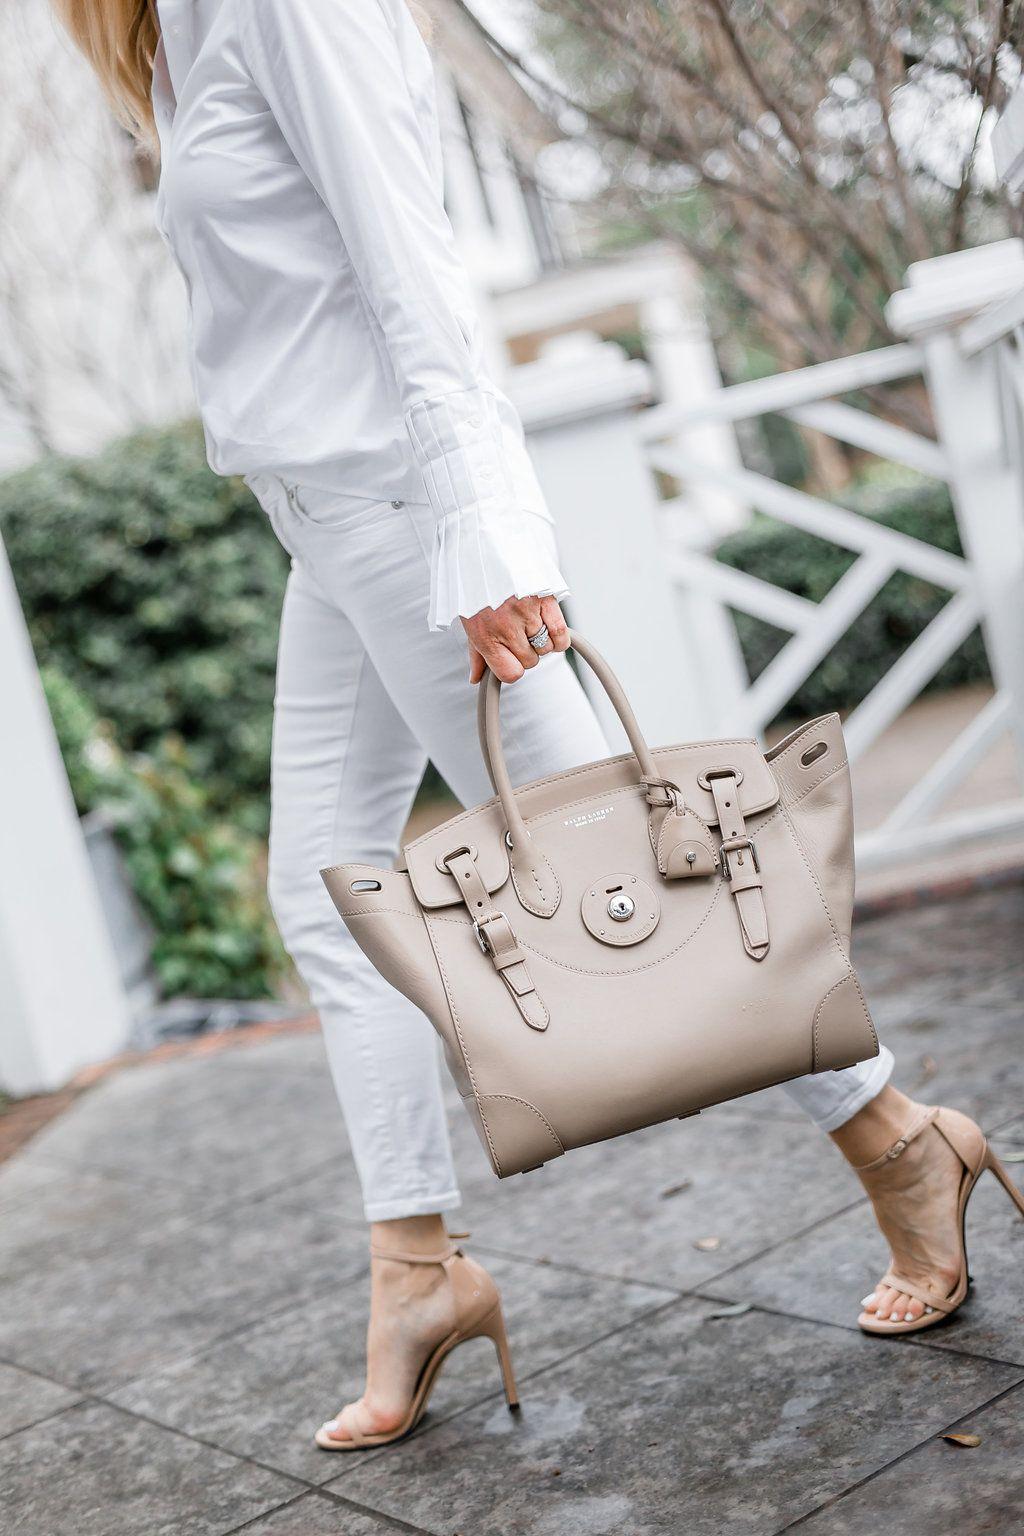 How To Get A Designer Handbag For A Fraction Of The Original Price Designer Bags For Less Dallas Fashion Dallas Fashion Blogger